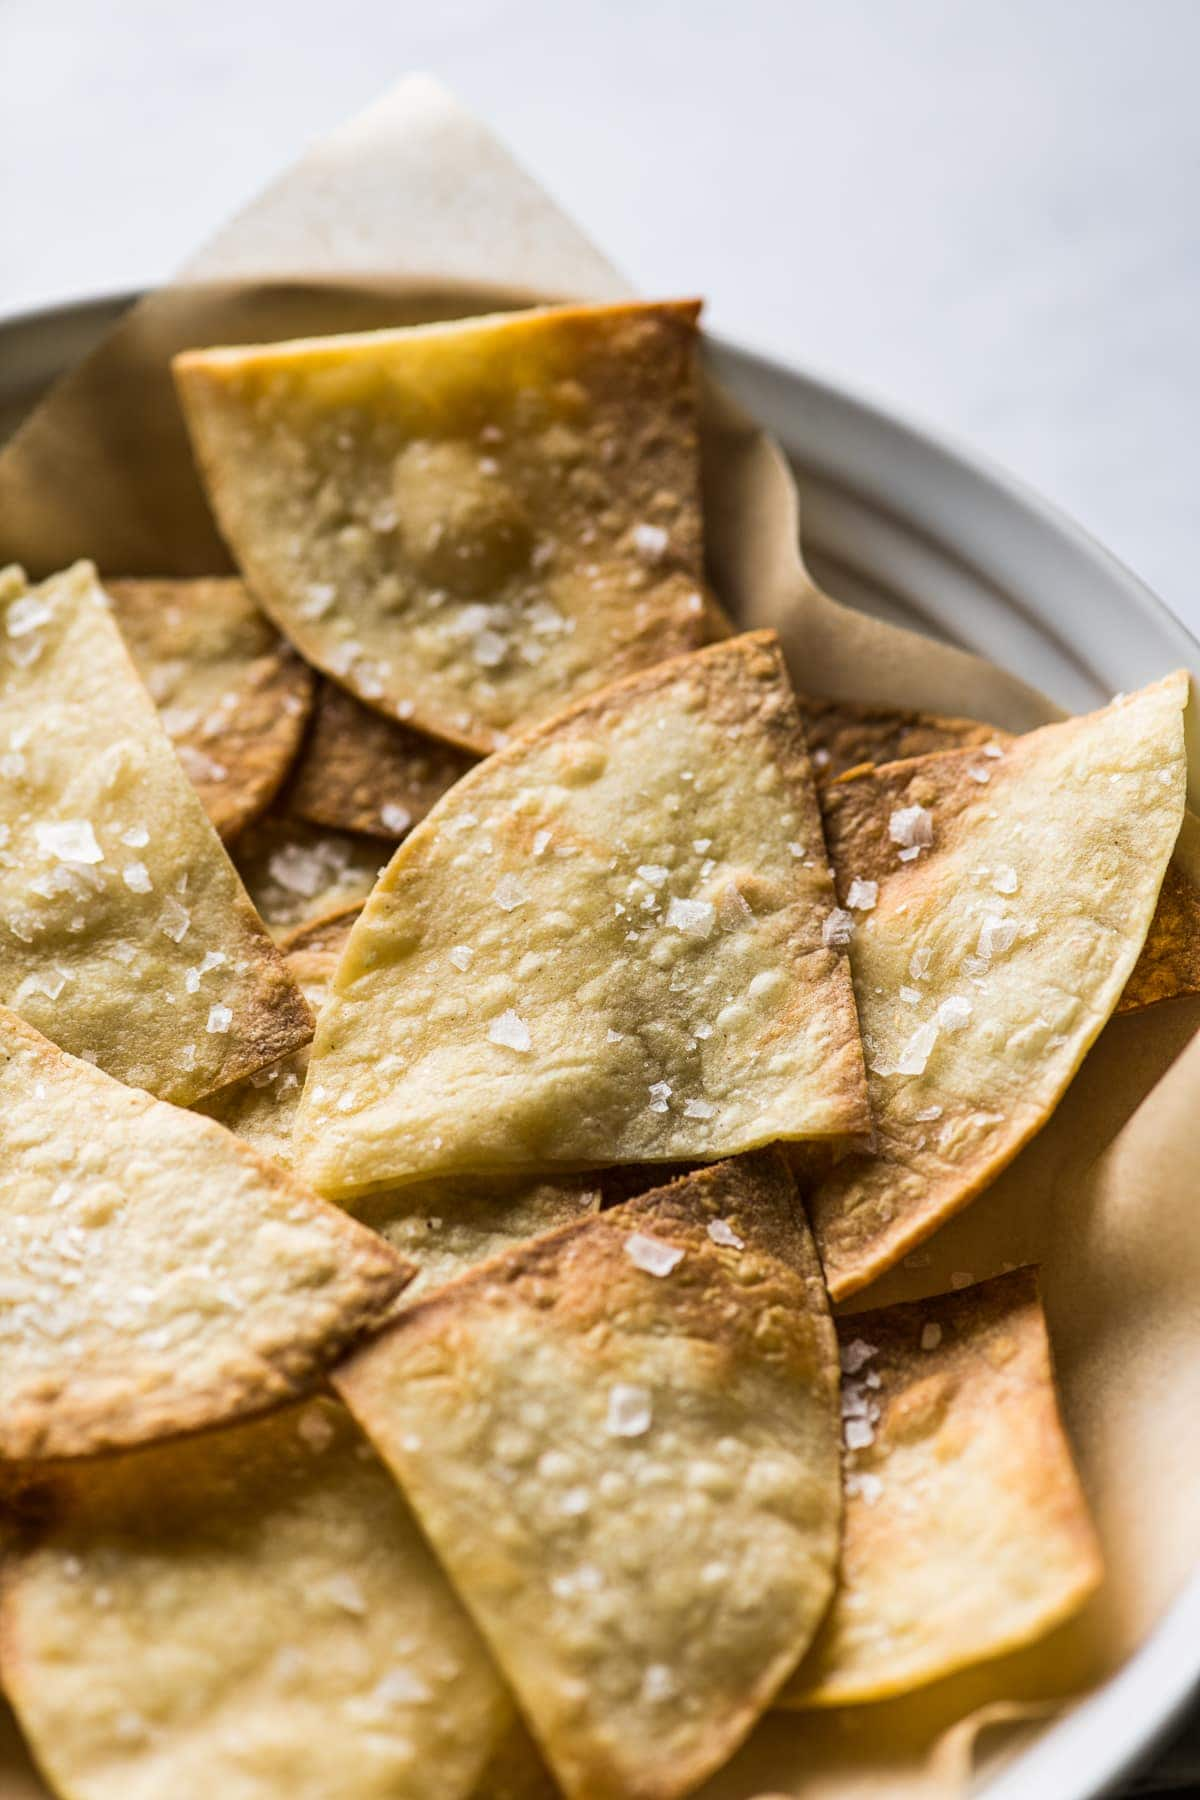 Air fryer tortilla chips seasoned with flaky sea salt.